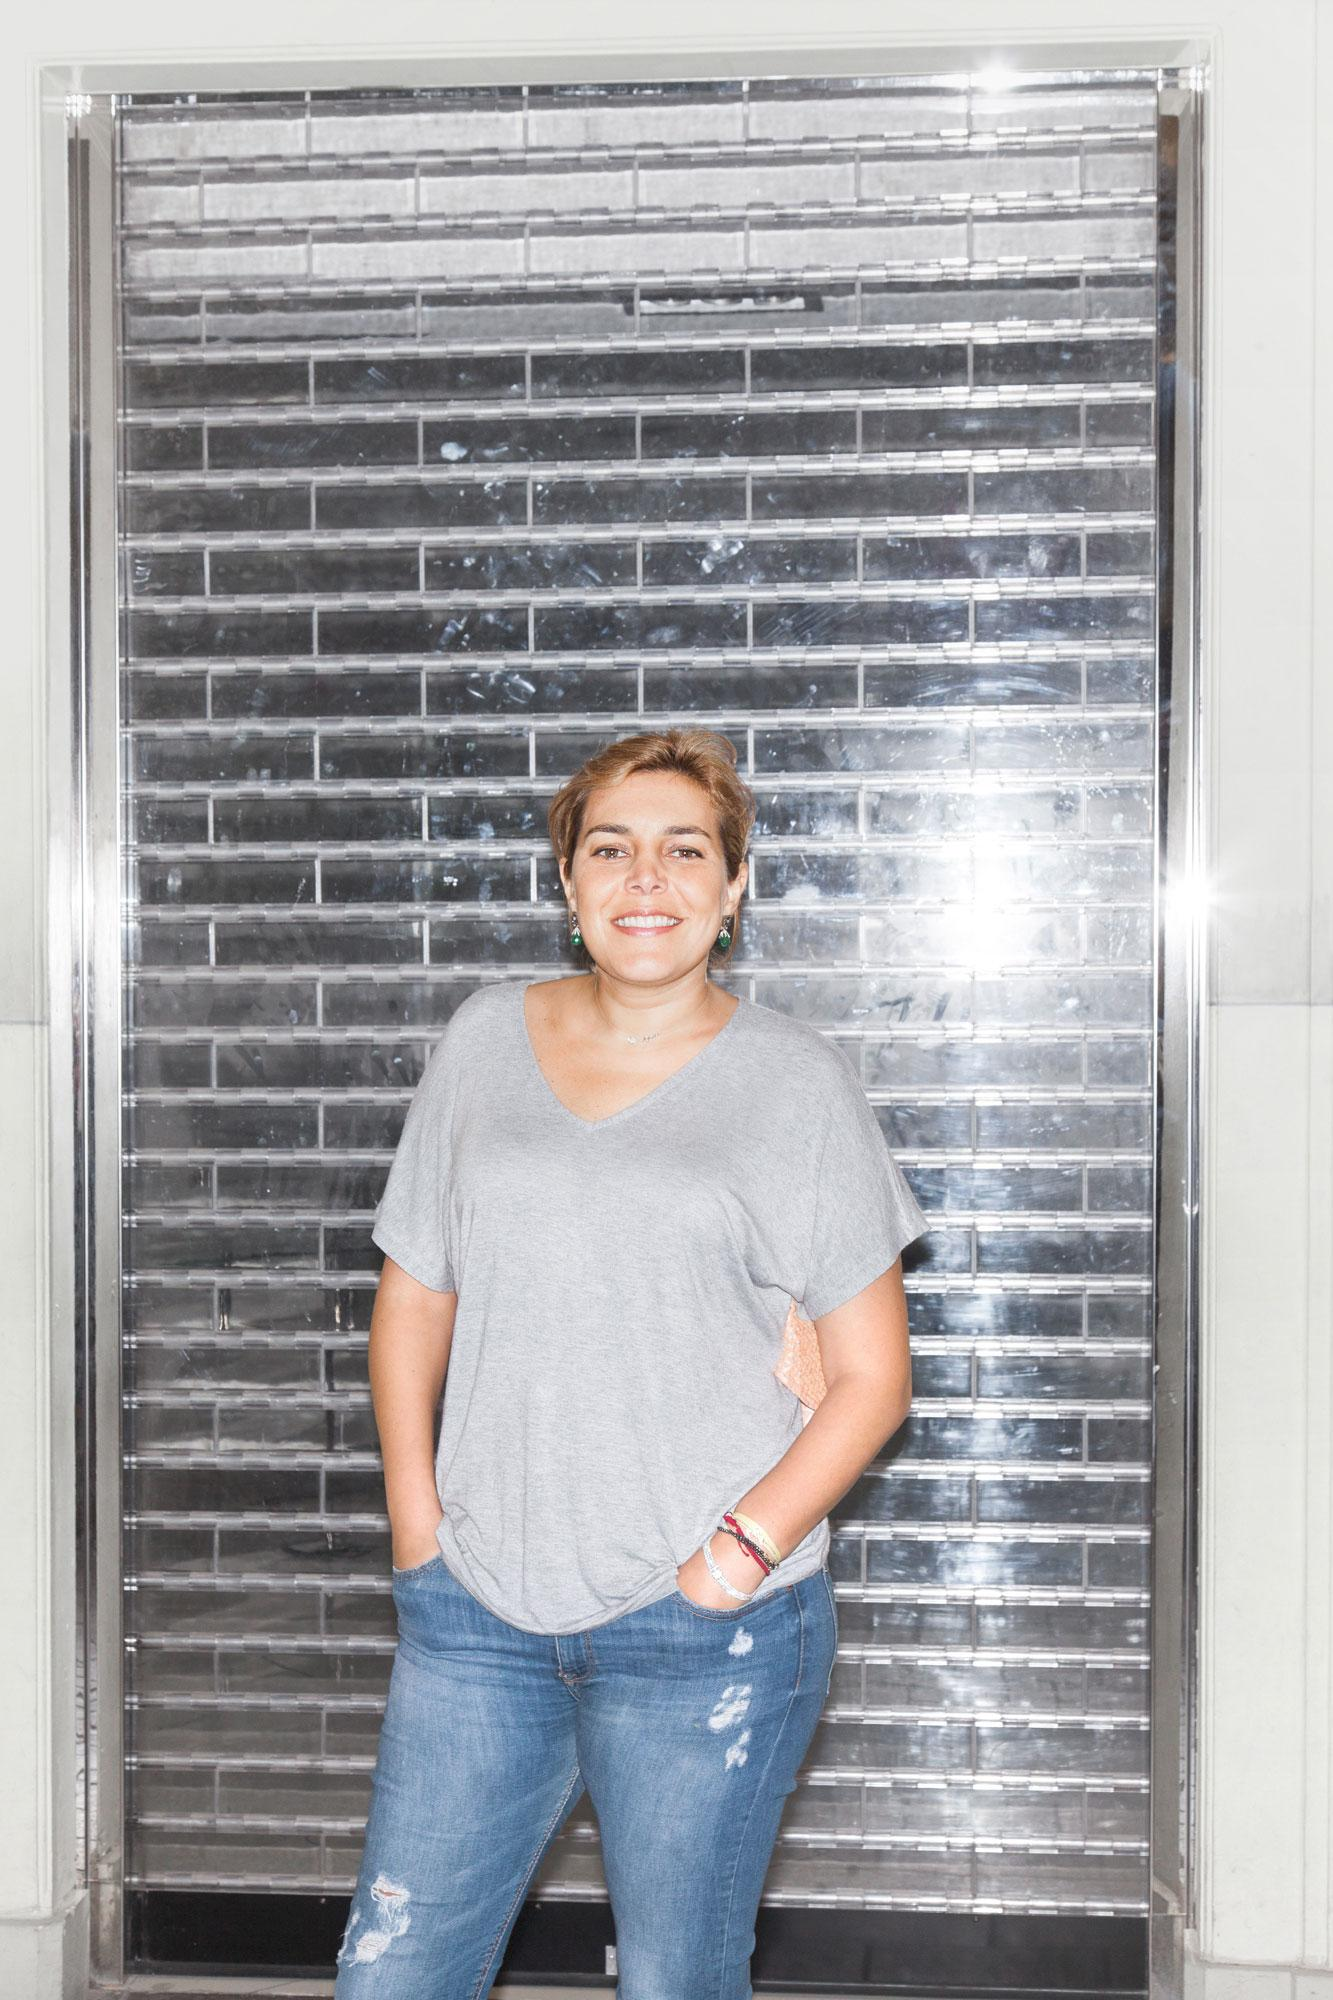 Myrna Ayad, director of Art Dubai